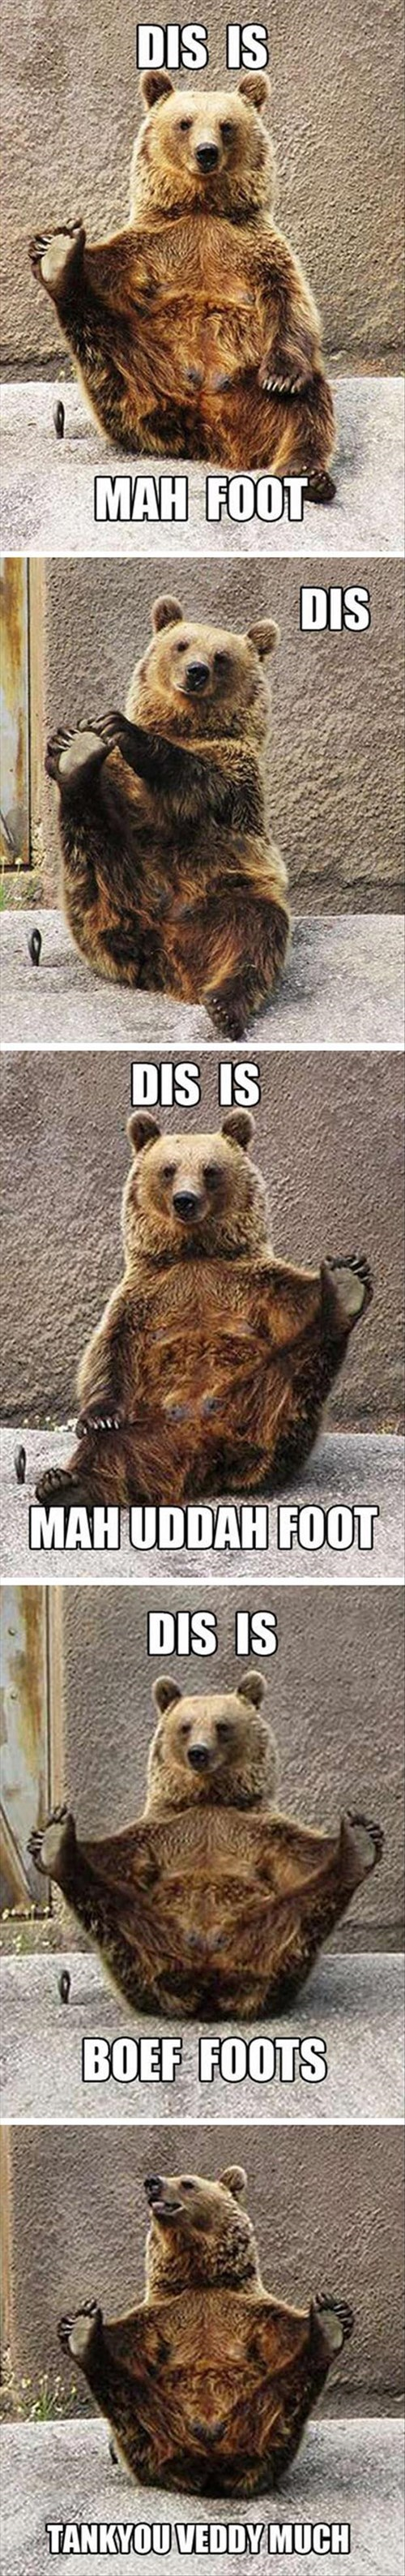 bears,feet,funny